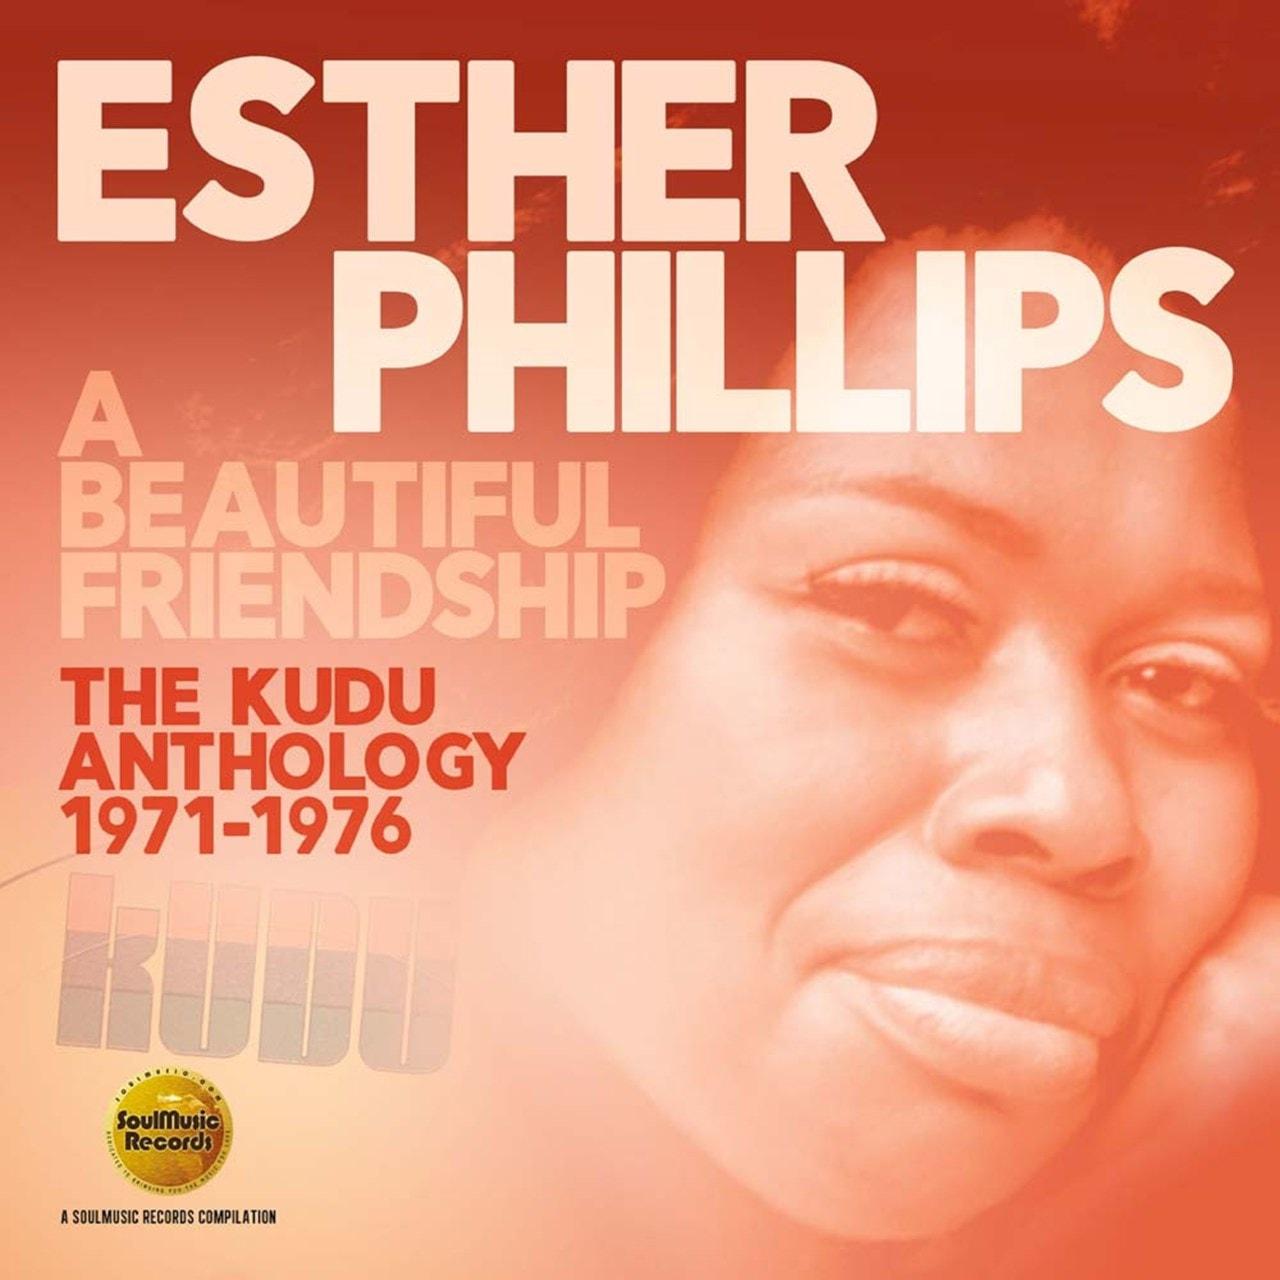 A Beautiful Friendship: The Kudo Anthology 1971-1976 - 1